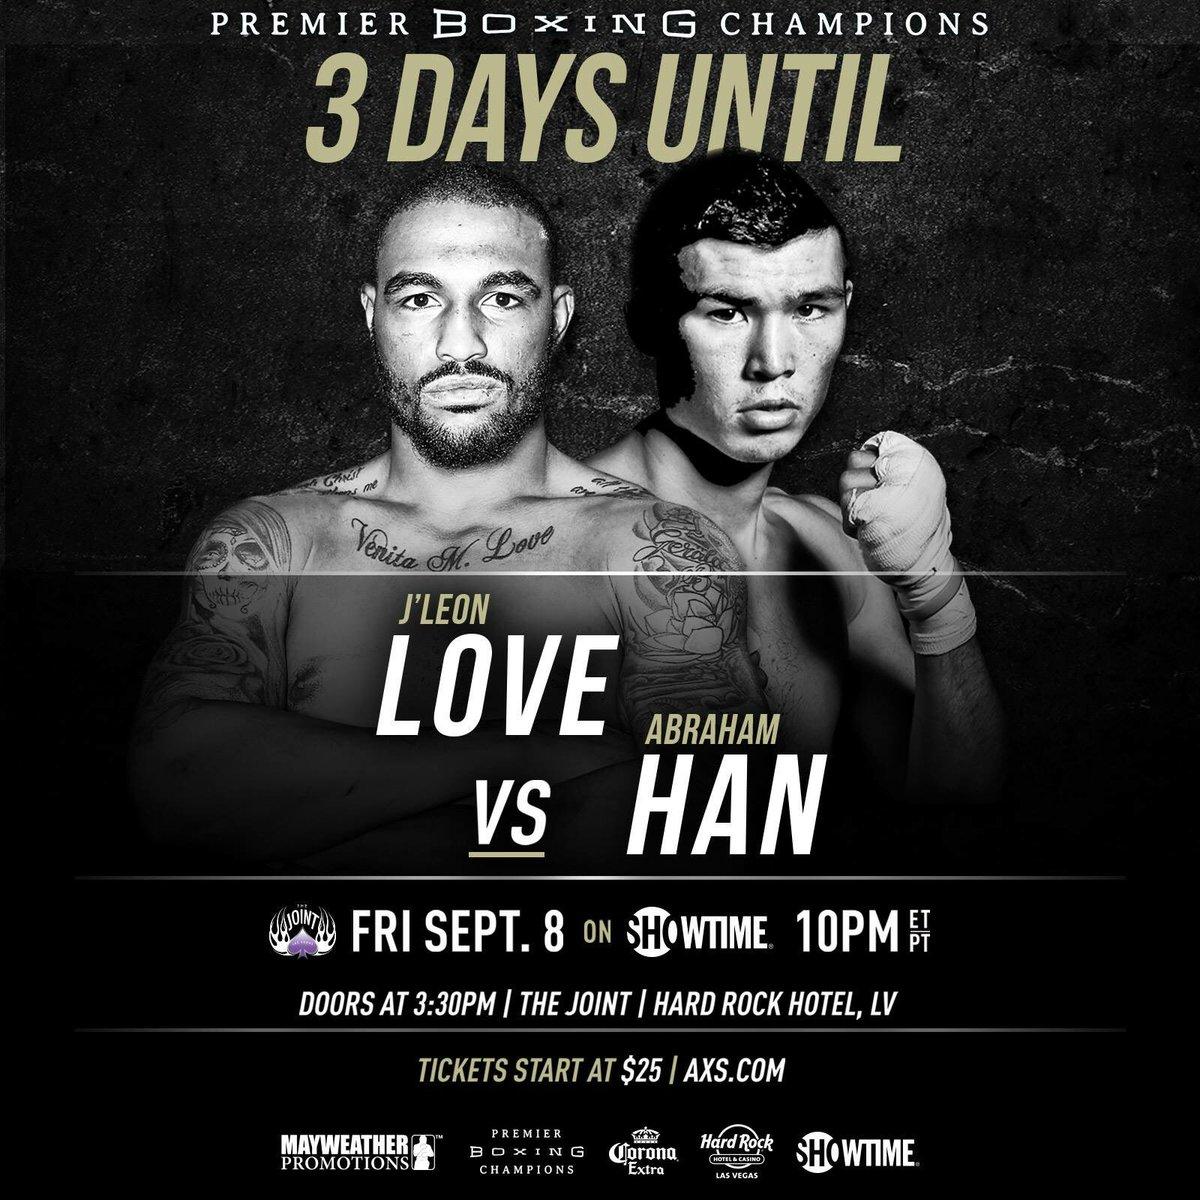 test Twitter Media - 3 Days until @JLeonLove 23-1 (13 KOs) takes on Abraham Han 26-3 (16 KOs)! Watch live on @ShowtimeBoxing 10pm ET/PT https://t.co/dU2VCWjPy2. https://t.co/FdMH0P6Mq0